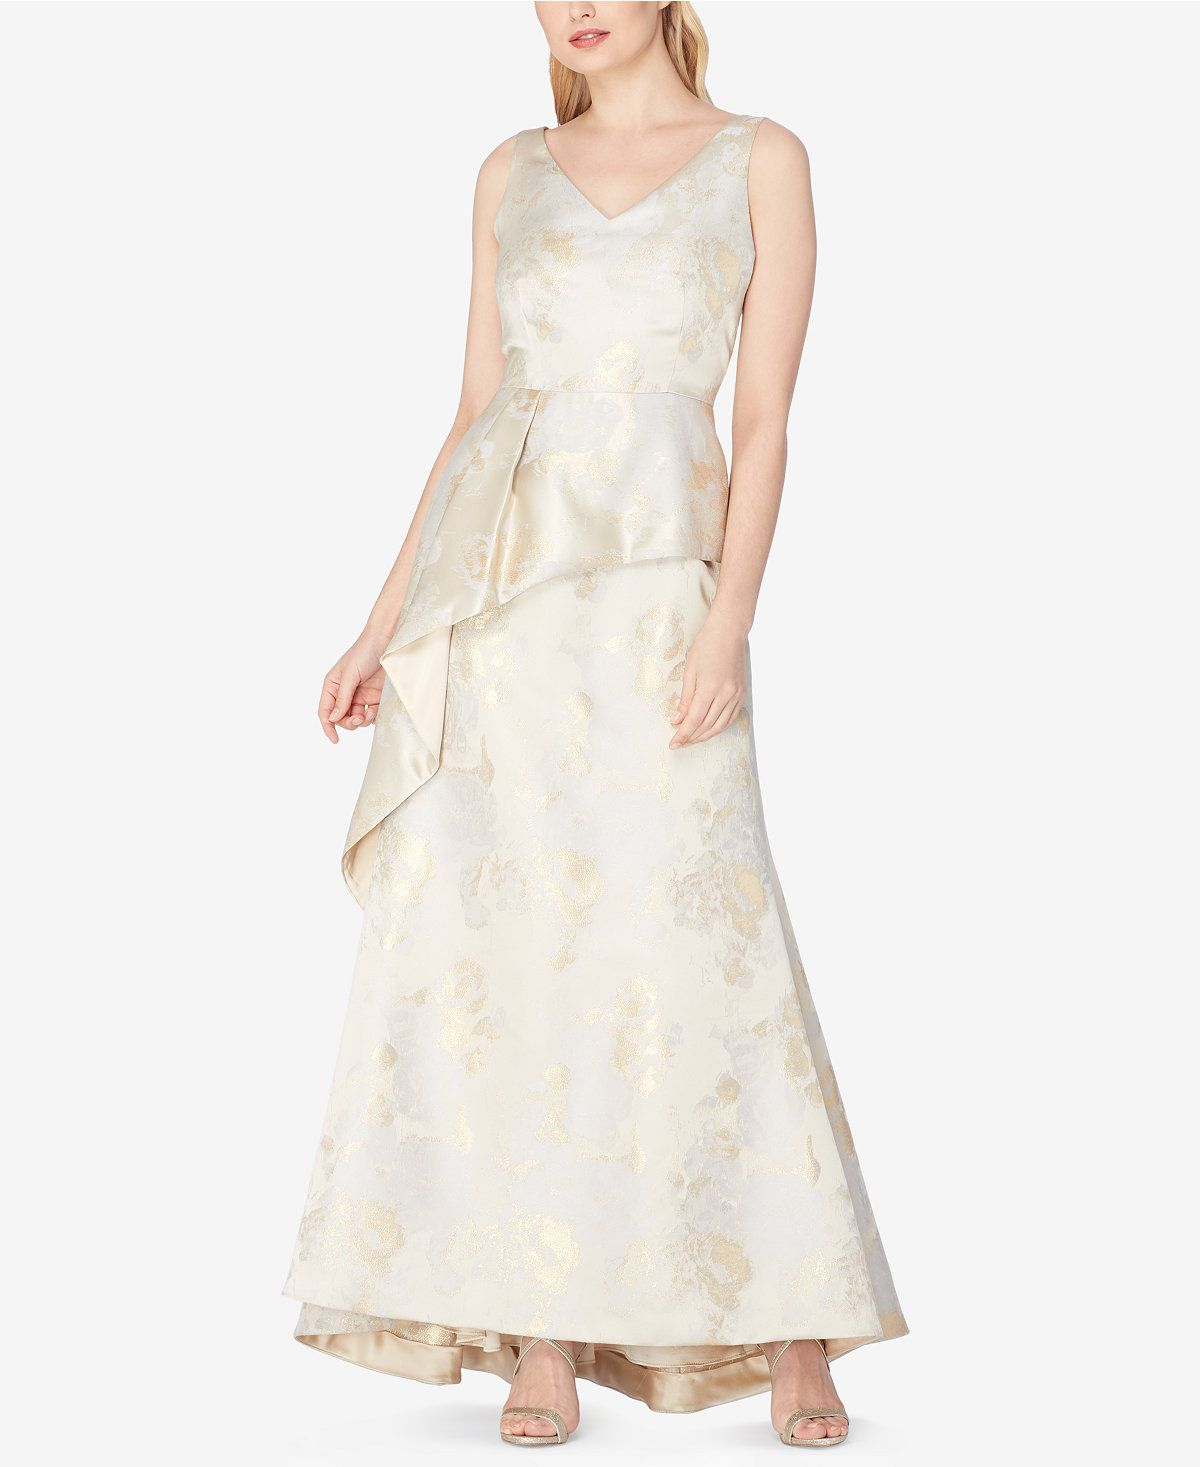 c4bab9074e10f Tahari ASL Jacquard Peplum Gown - Dresses - Women - Macy's | formal ...